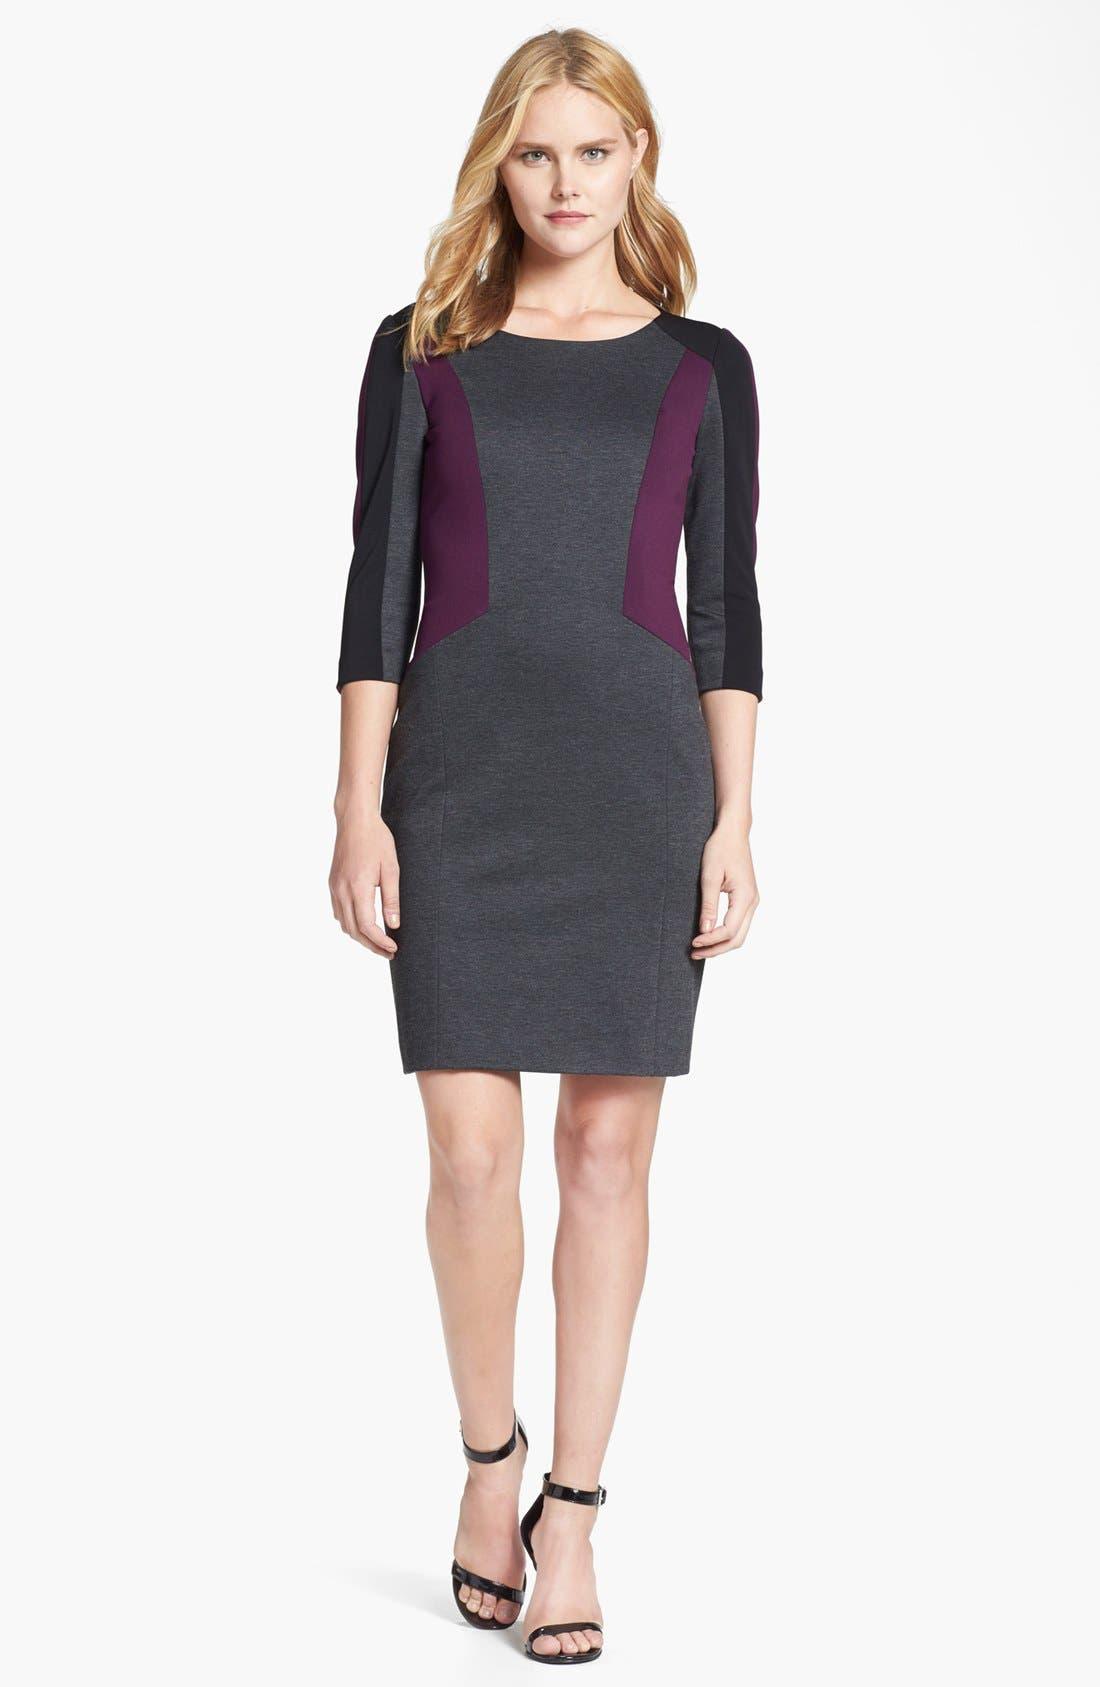 Alternate Image 1 Selected - Tahari Colorblock Sheath Dress (Petite)